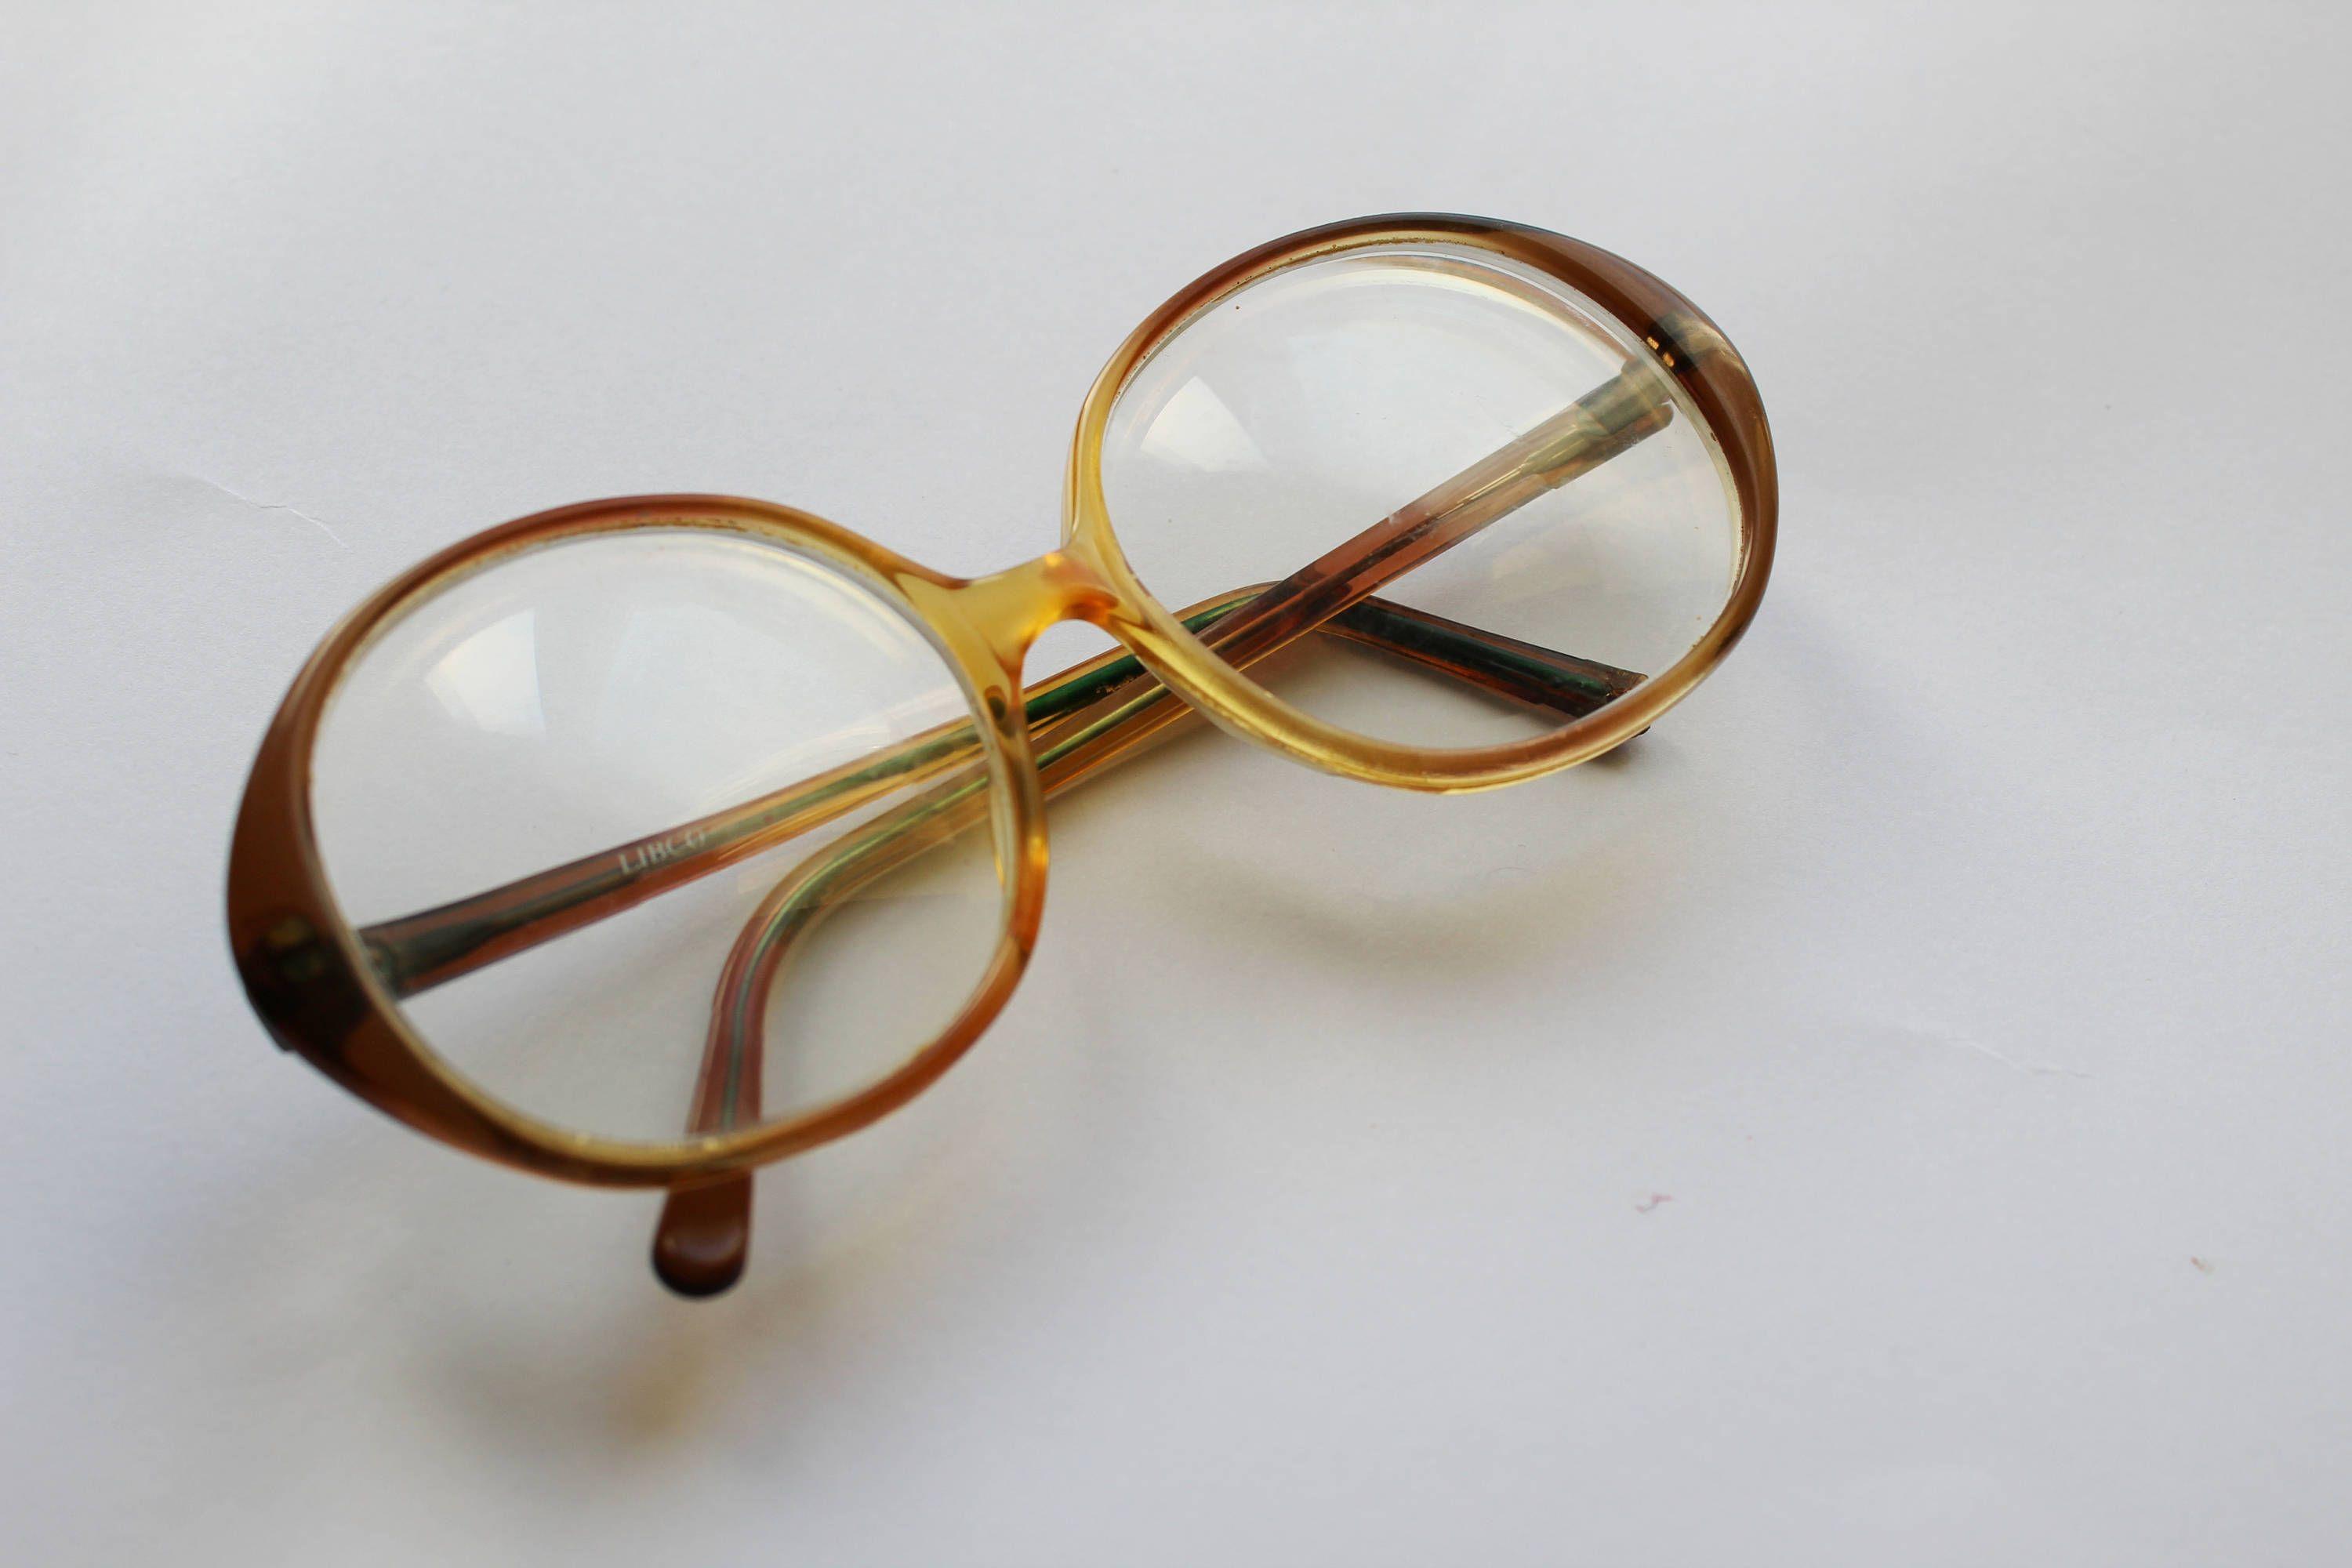 6ee17ebd30 Vintage Eyeglasses Round Frames Vintage Glasses Grandma Eyewear Grandpa  Glasses Tortoise Glasses Hipster 80s Antique Ladies Old Eyeglasses